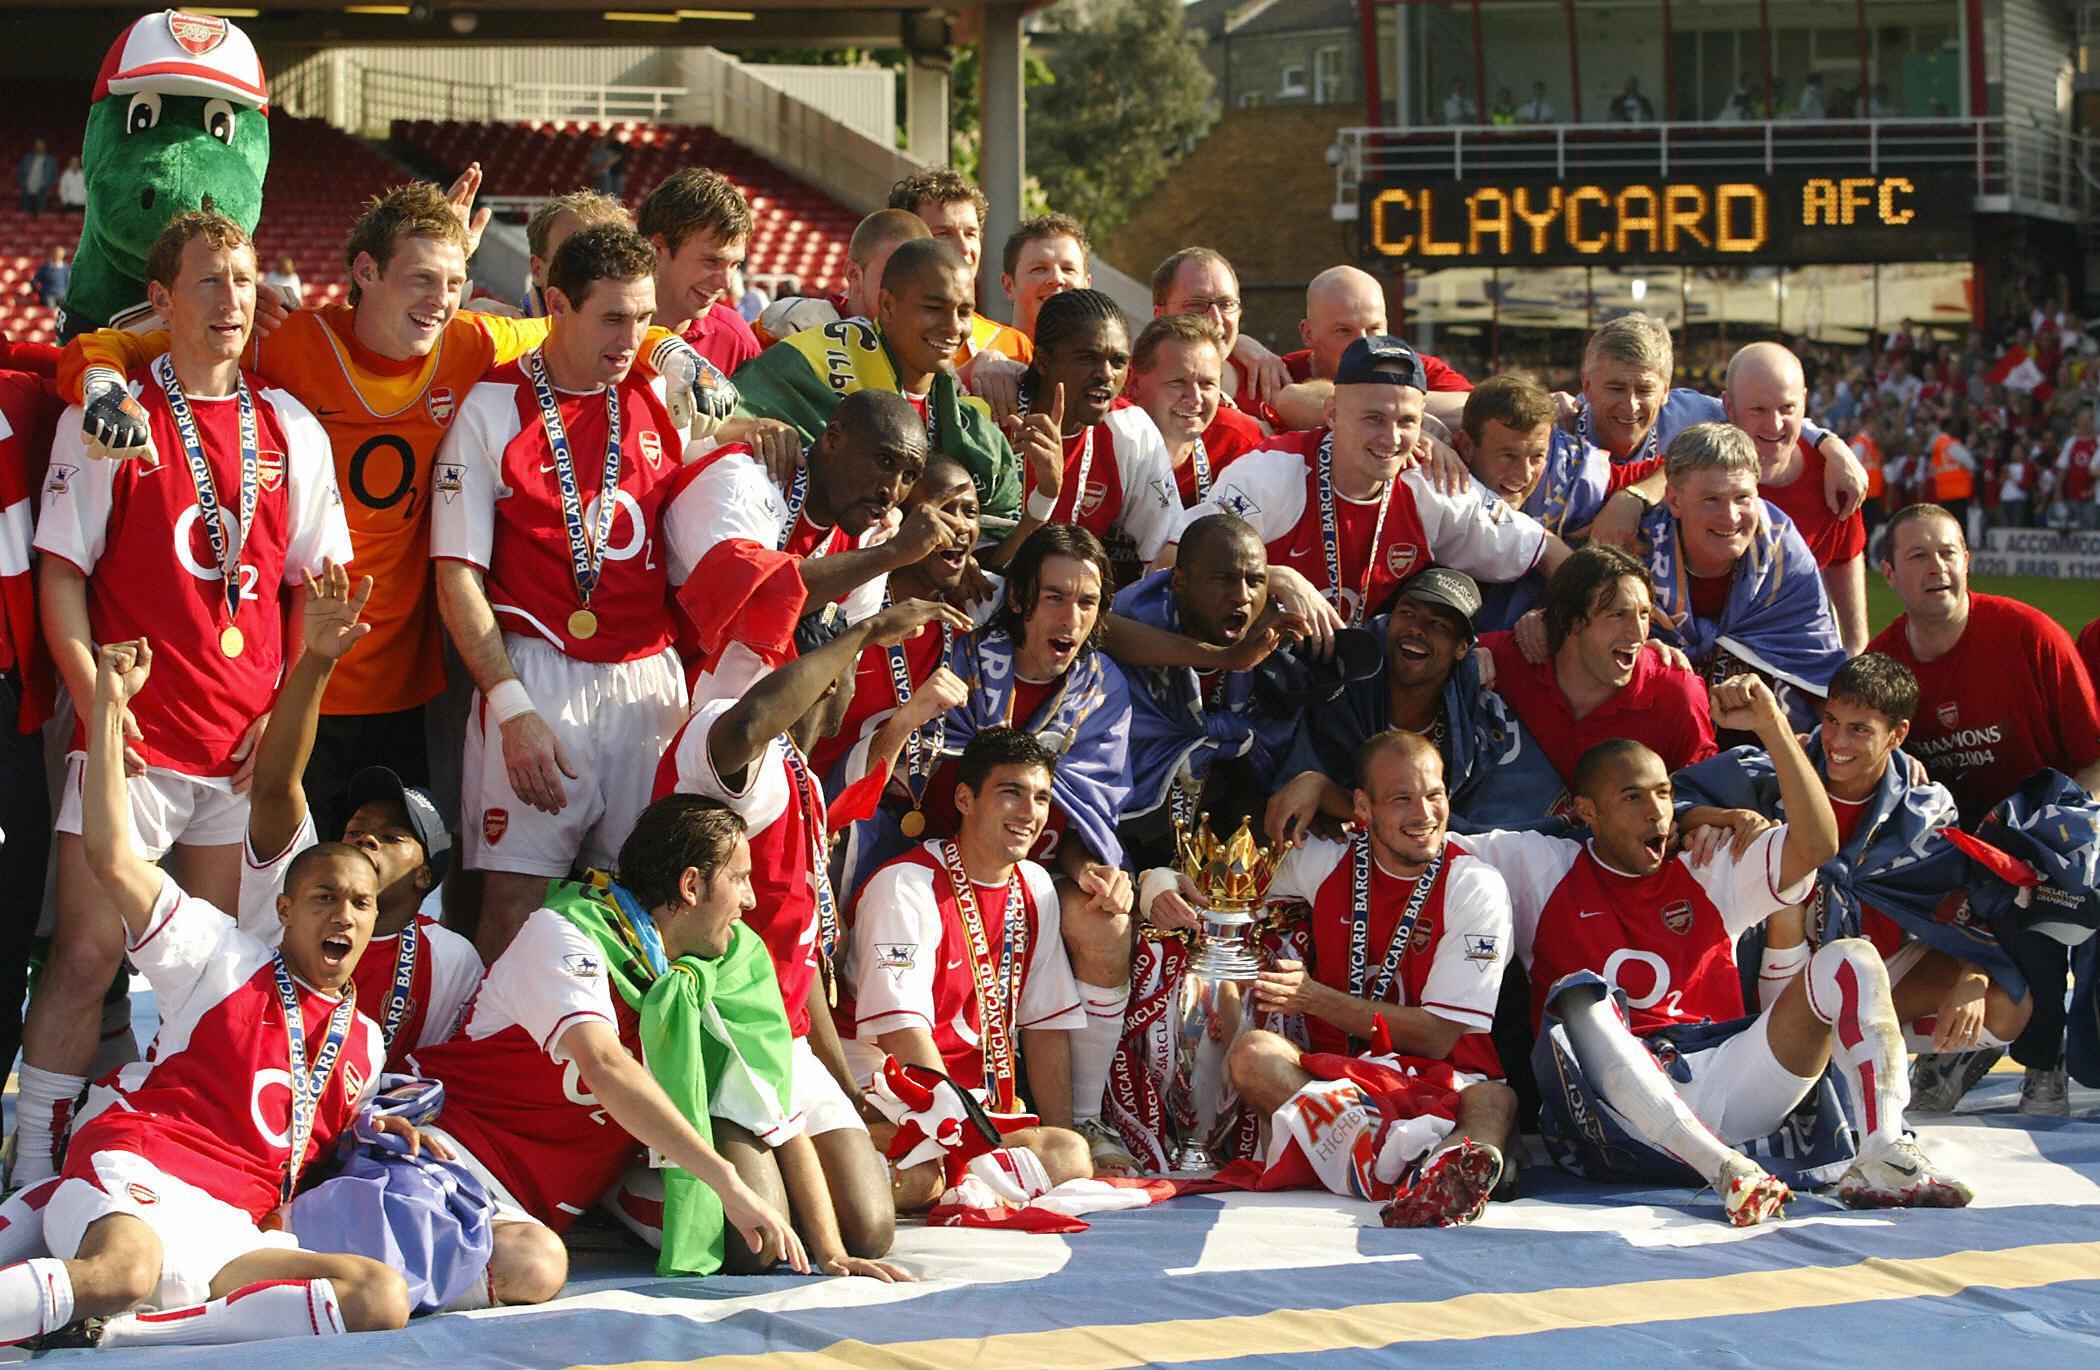 Arsenal celebrating winning the 2004 Premiership title